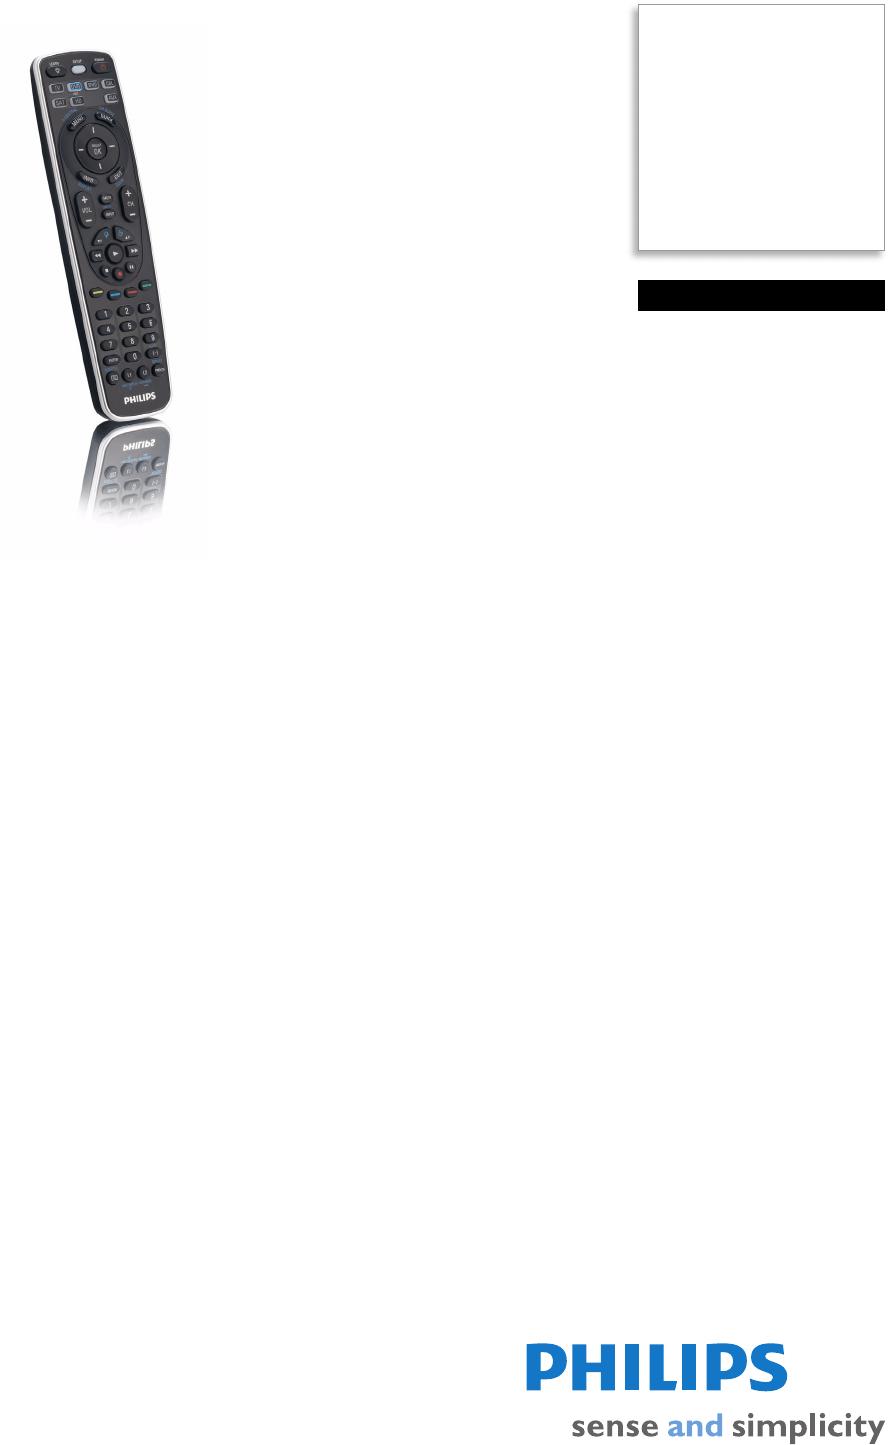 Philips SRU5107WM17 SRU5107WM/17 Universal Remote Control